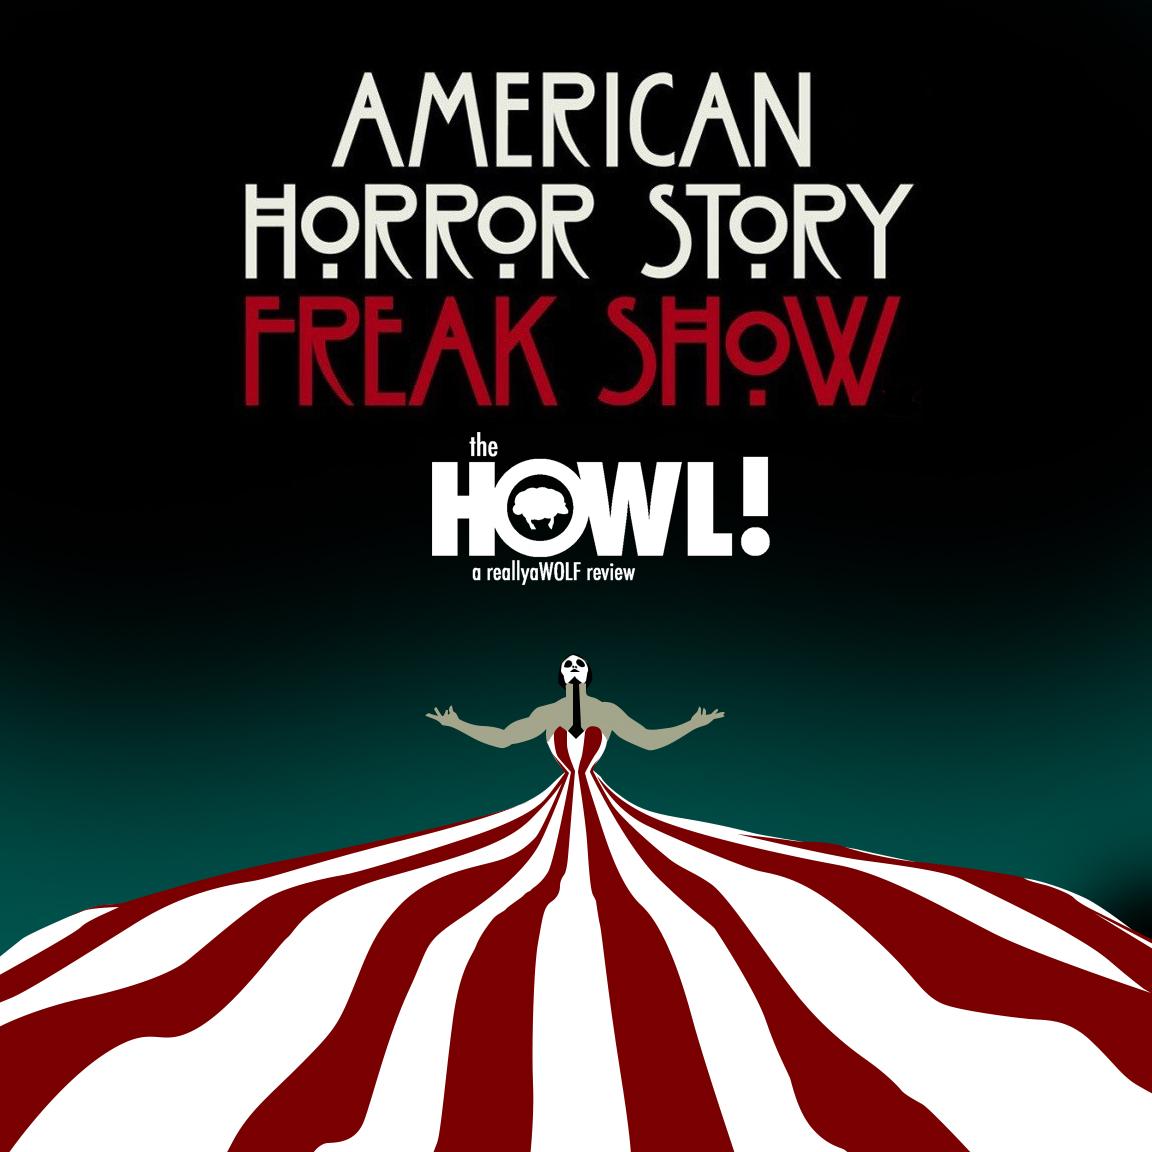 American Horror Story Freak Show raW